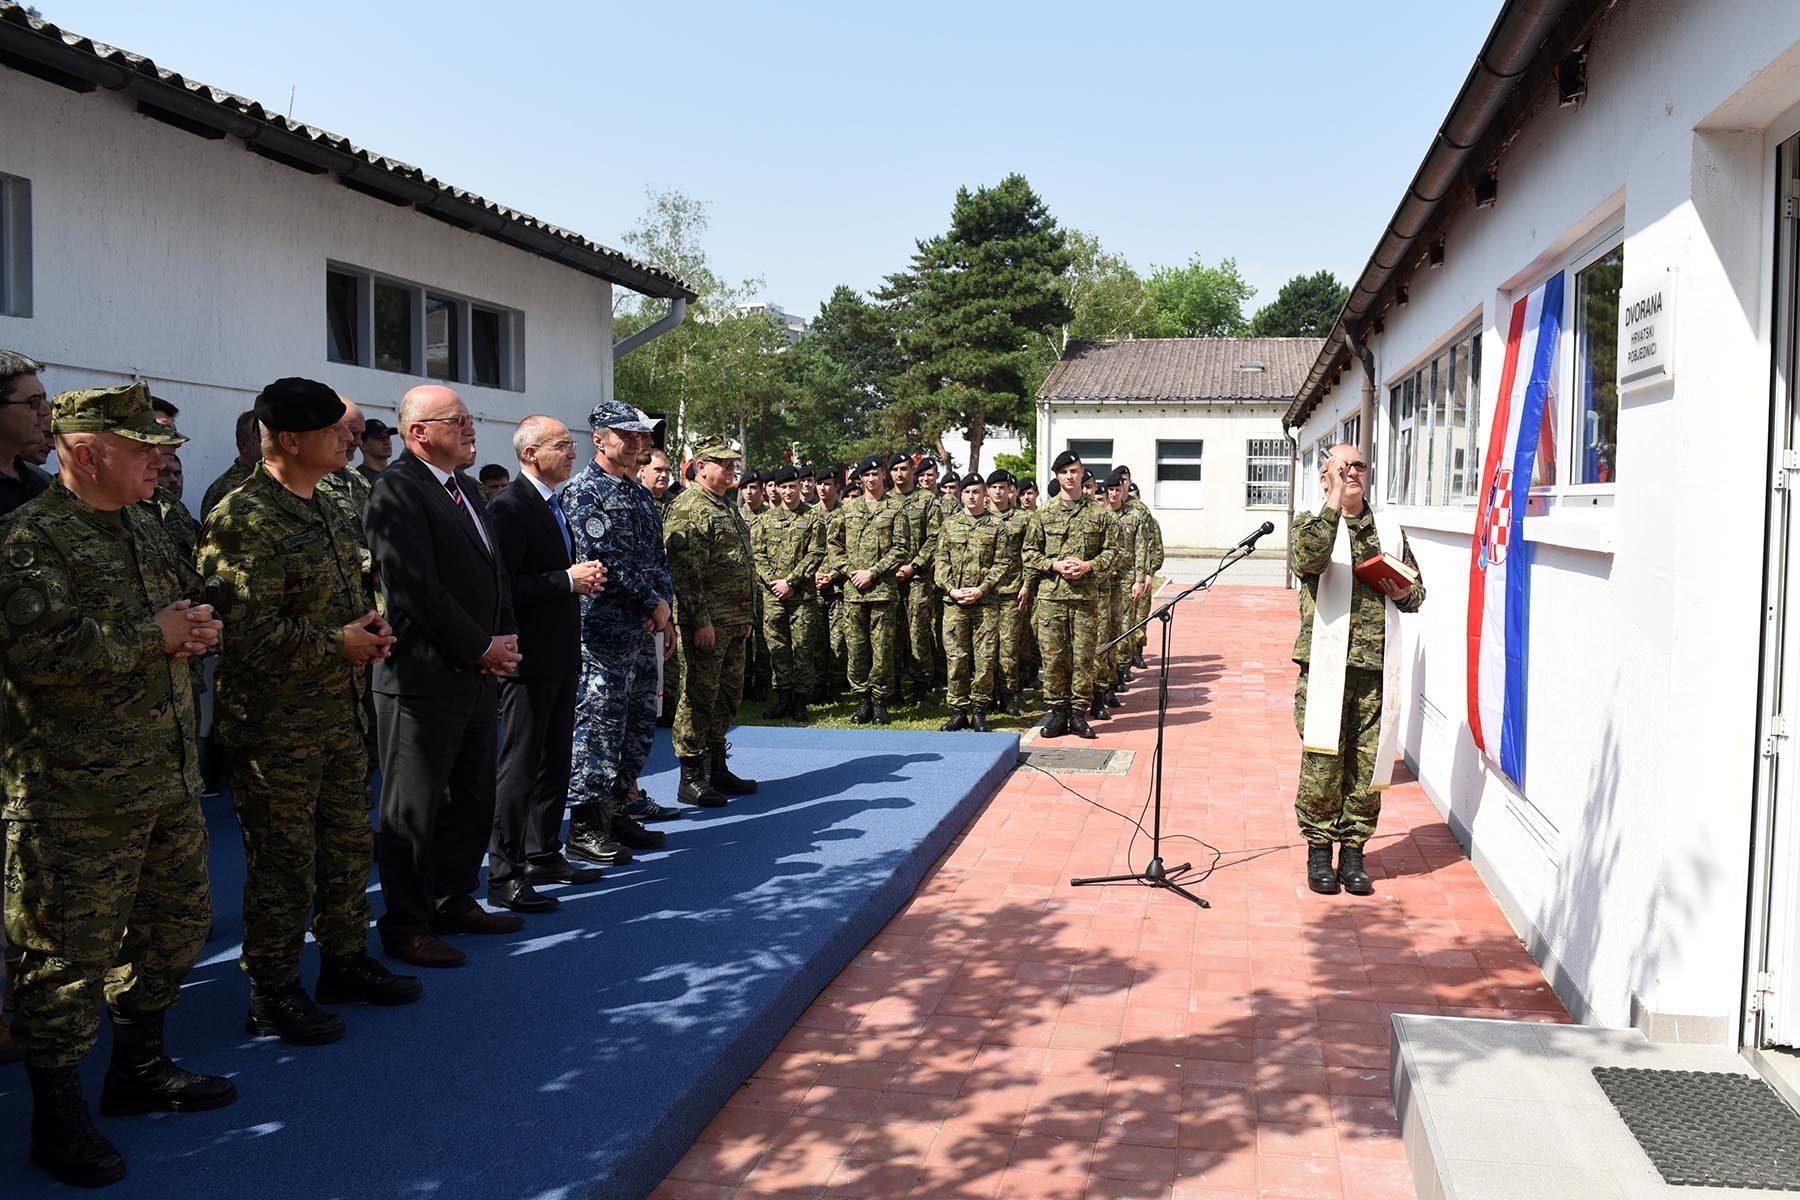 Održan Športski dan pripadnika Hrvatske vojske